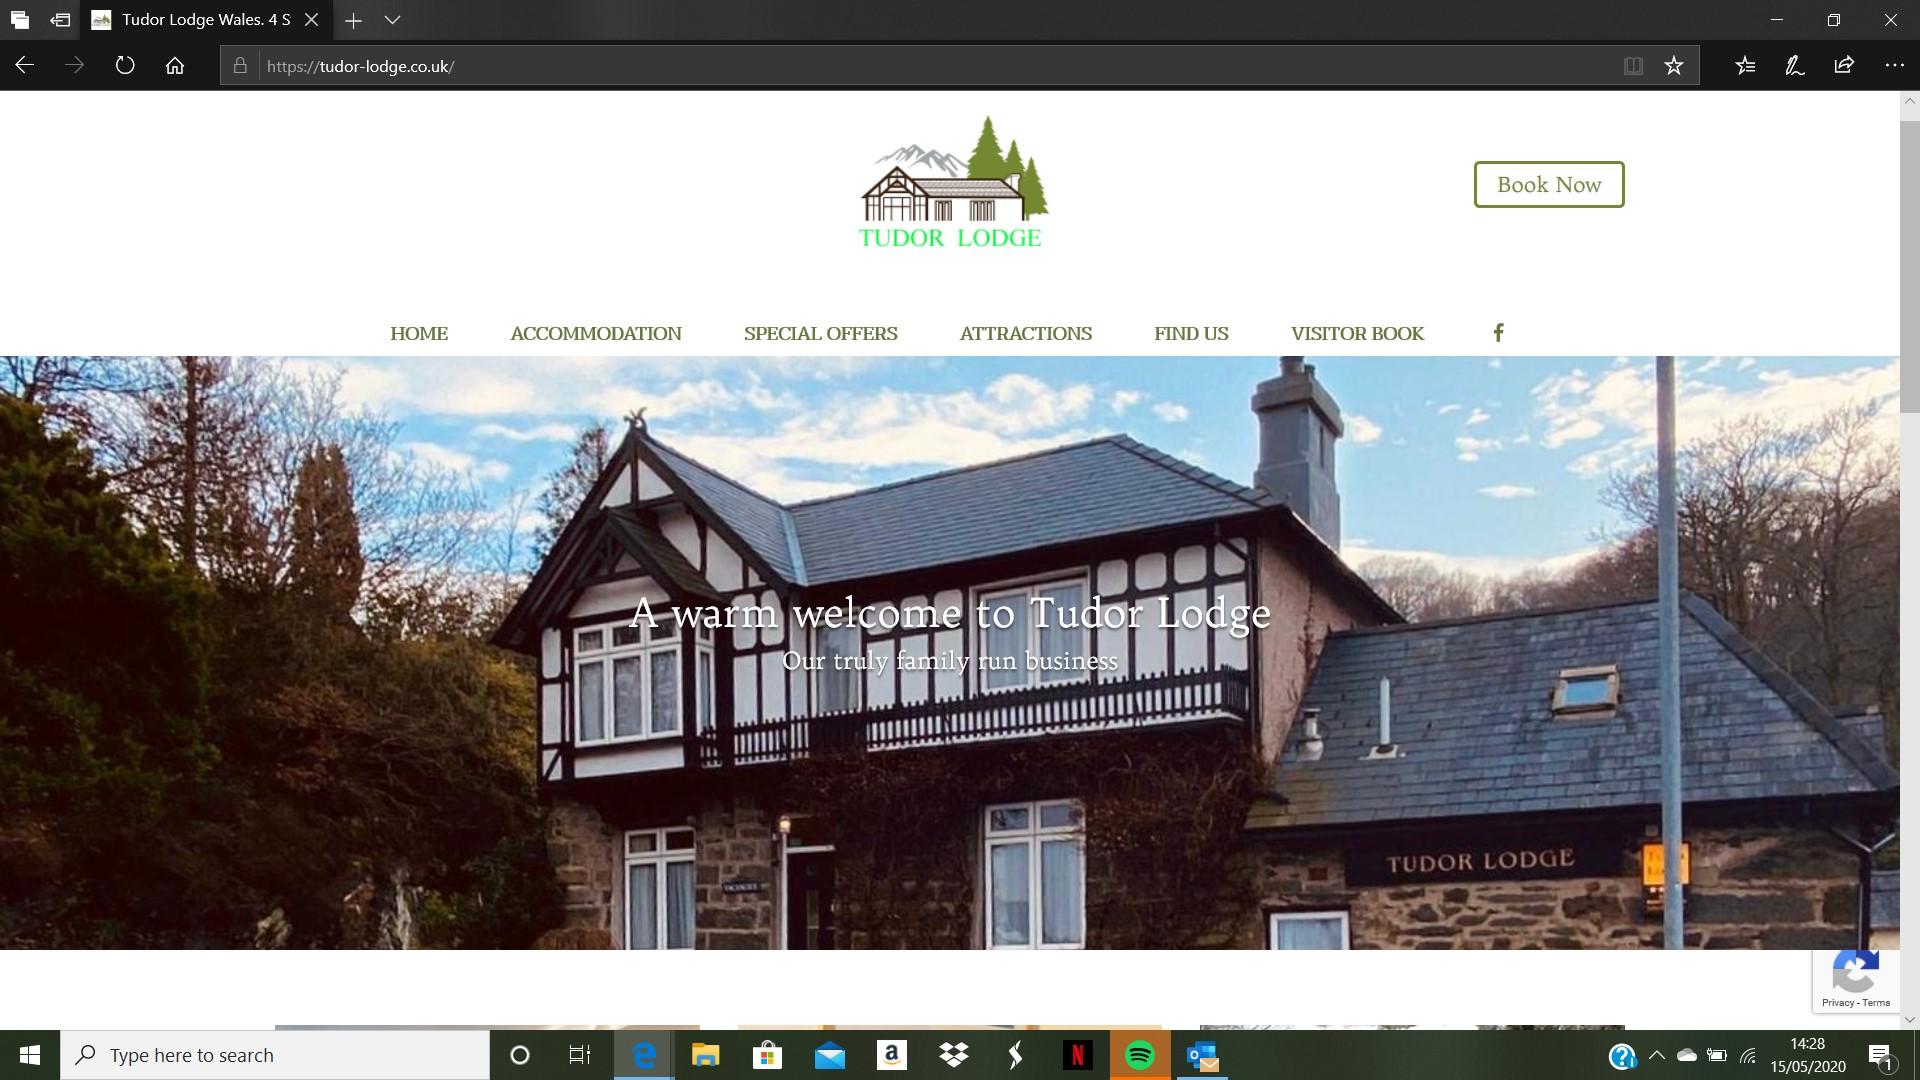 Hetzwebz Portfolio - Web designer in Matlock